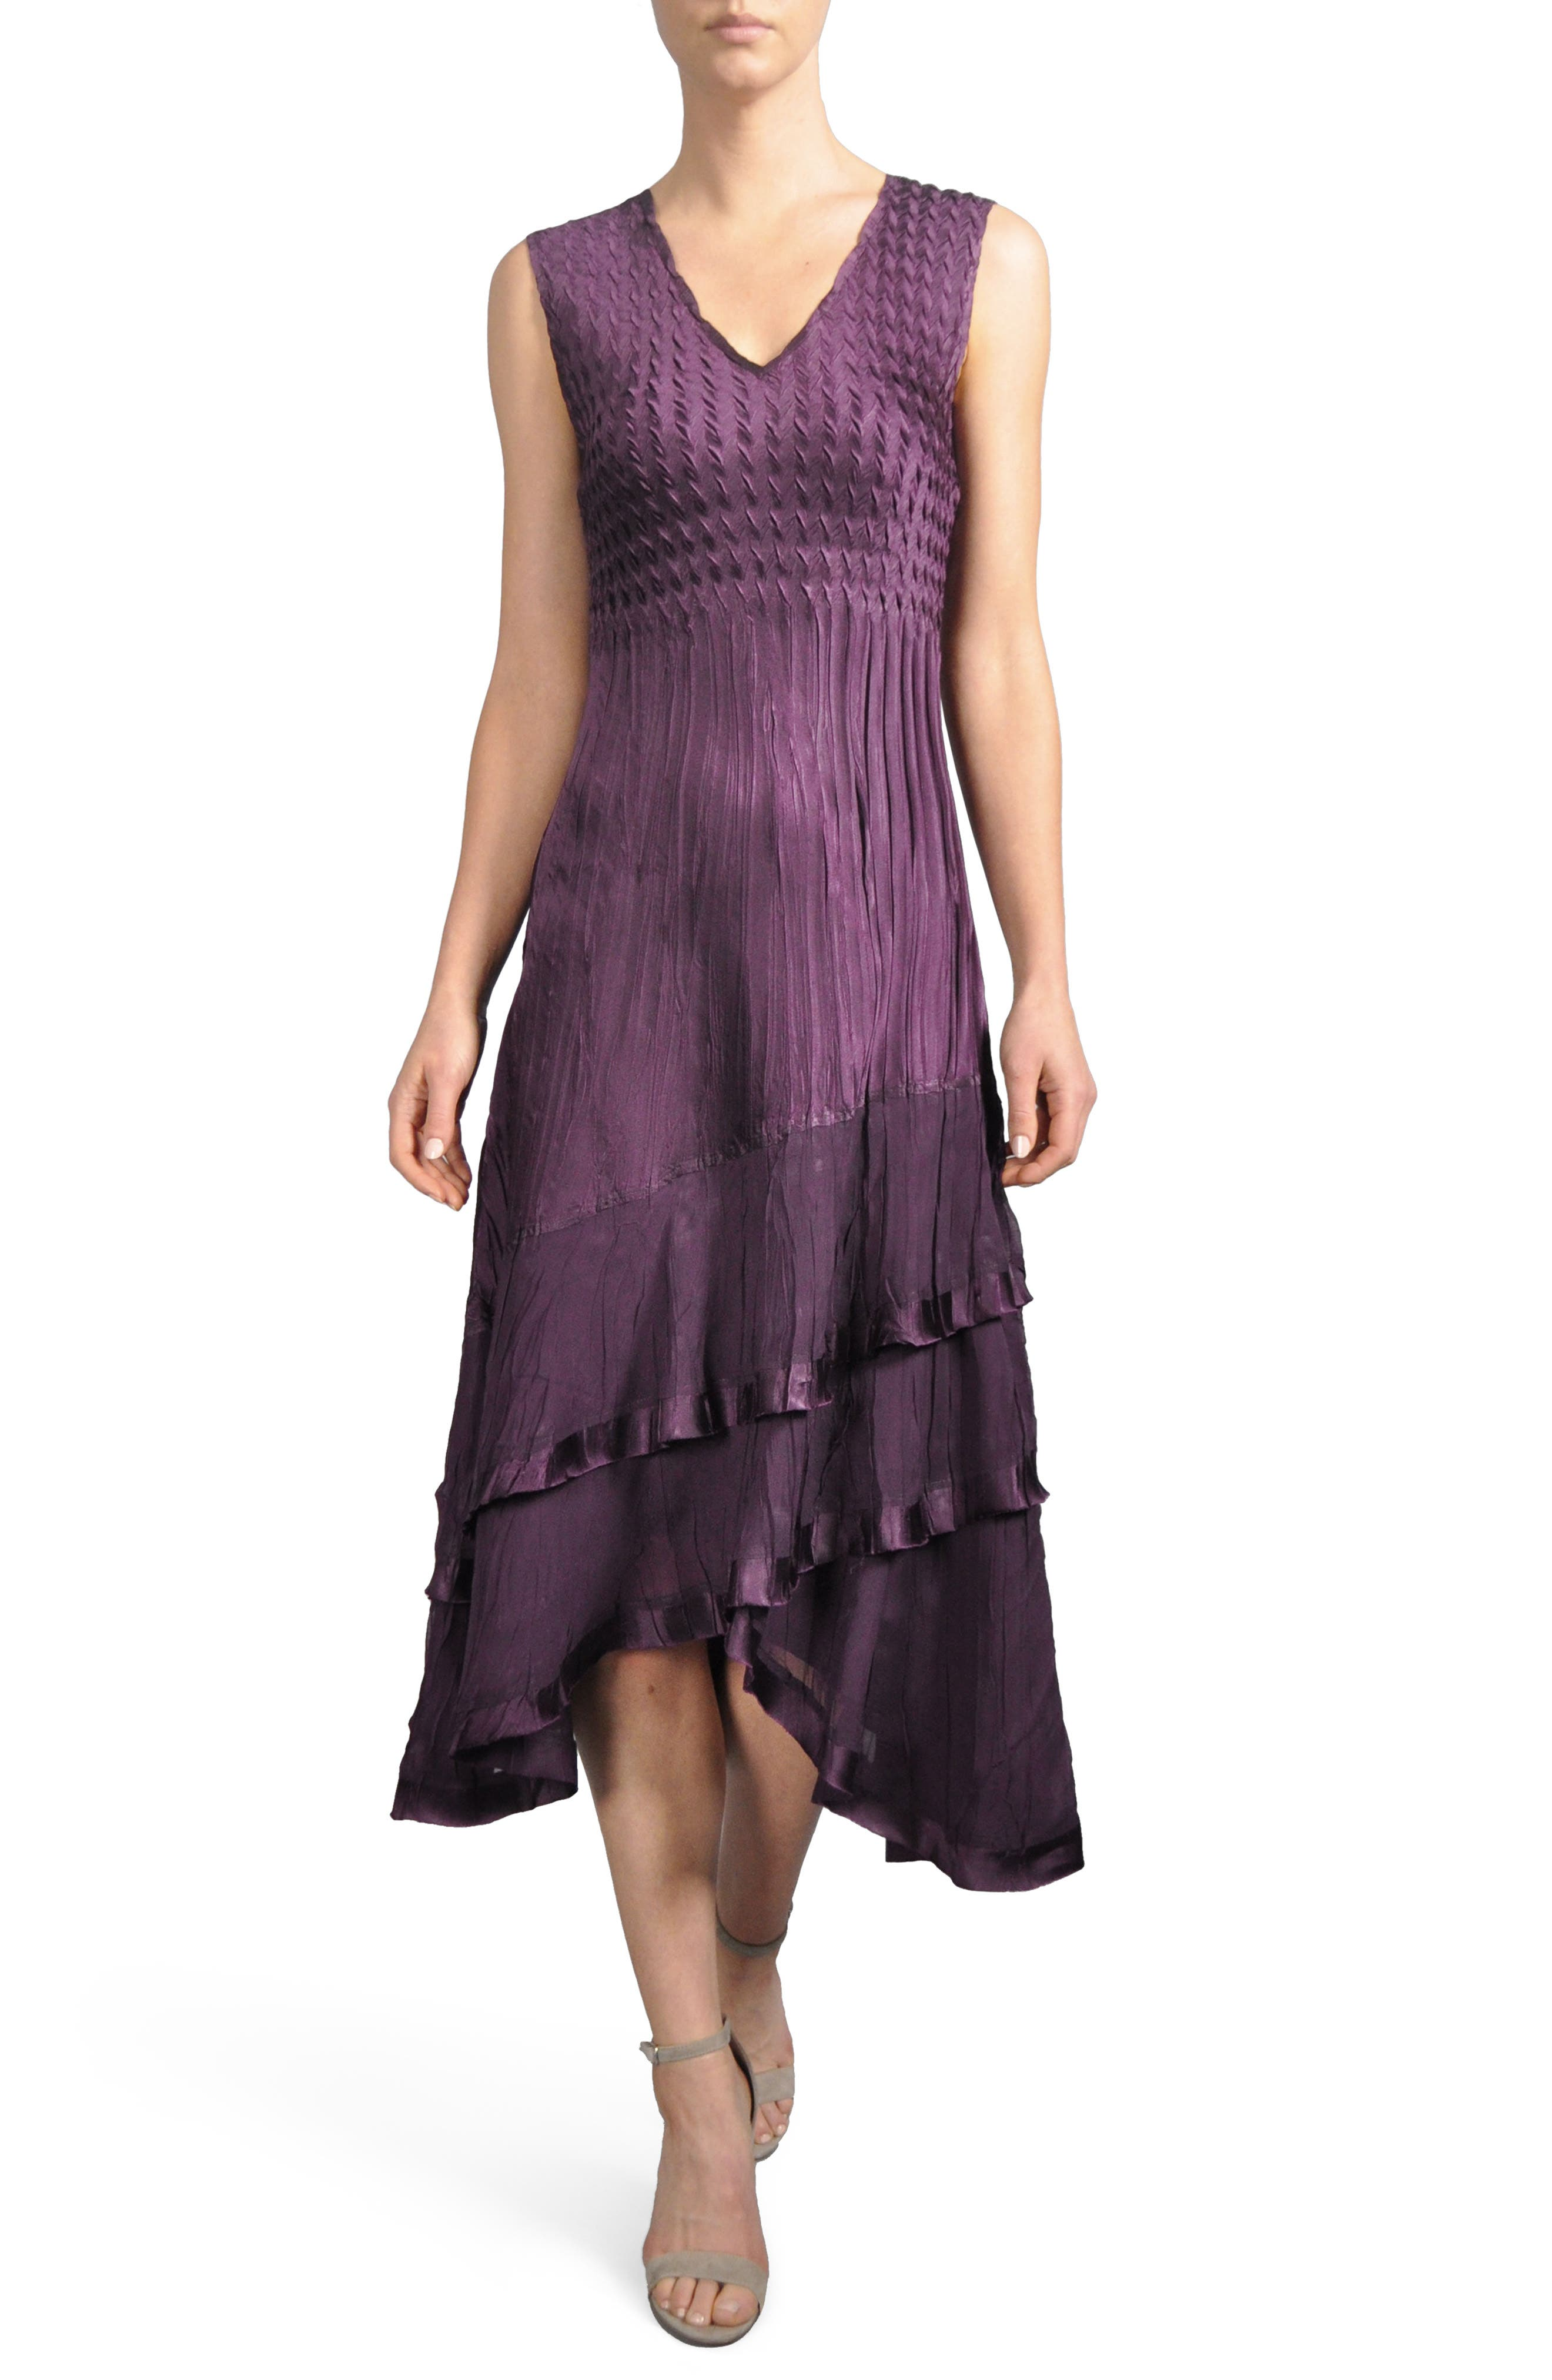 Komorov Textured Tiered Midi Dress with Jacket,                             Alternate thumbnail 2, color,                             Aubergine